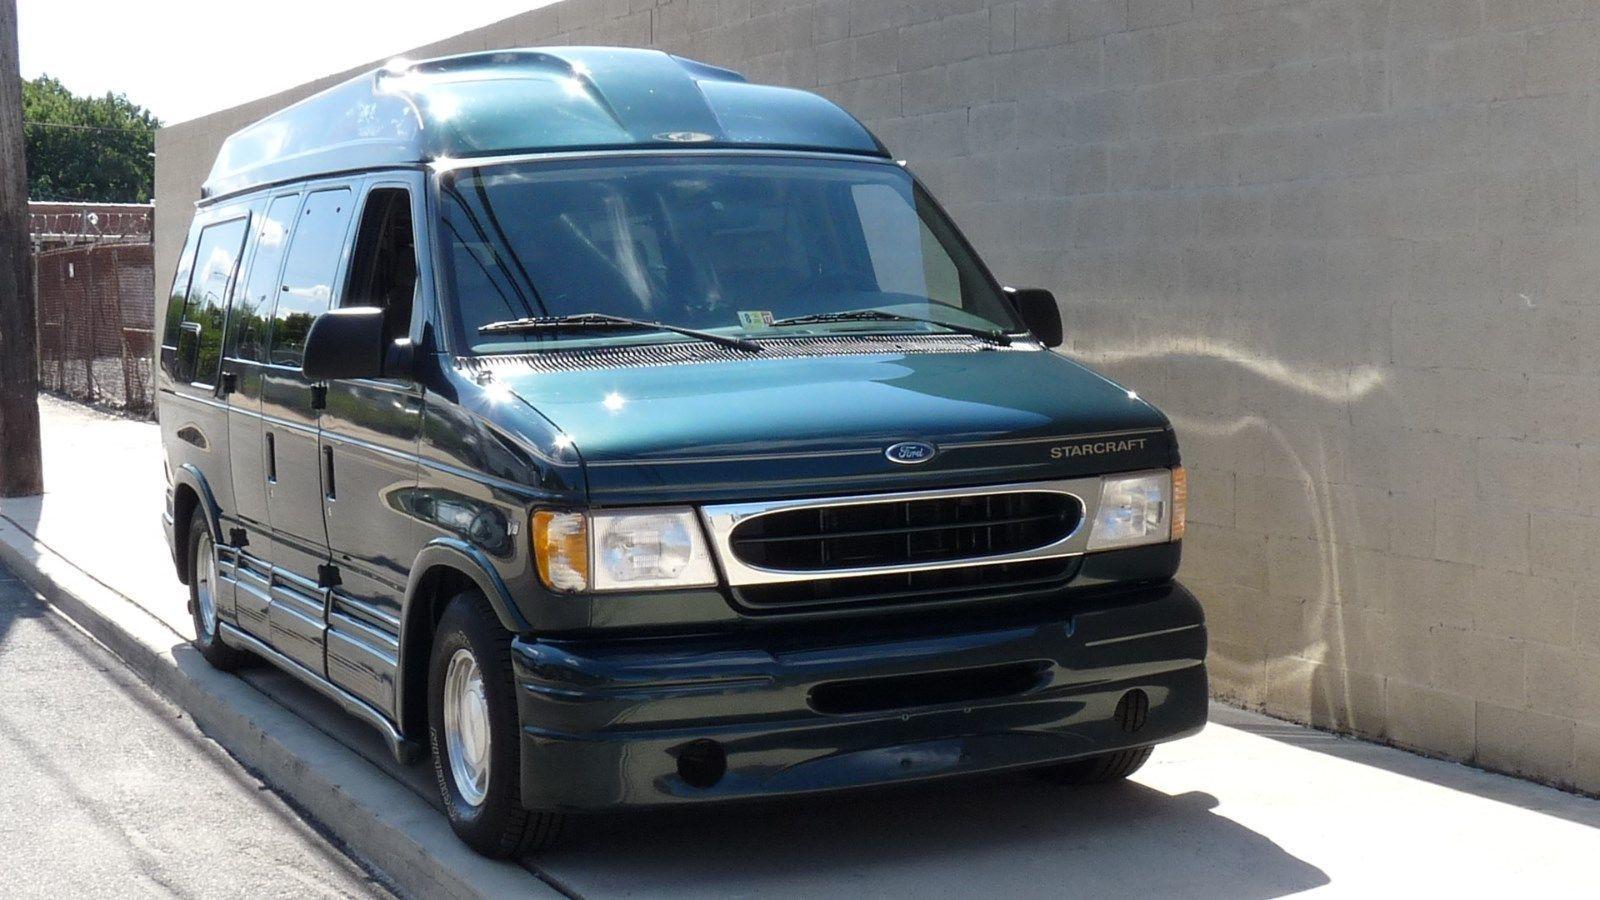 1999 Ford E Series Van E150 Conversion Van 2 Door Ebay Starcraft